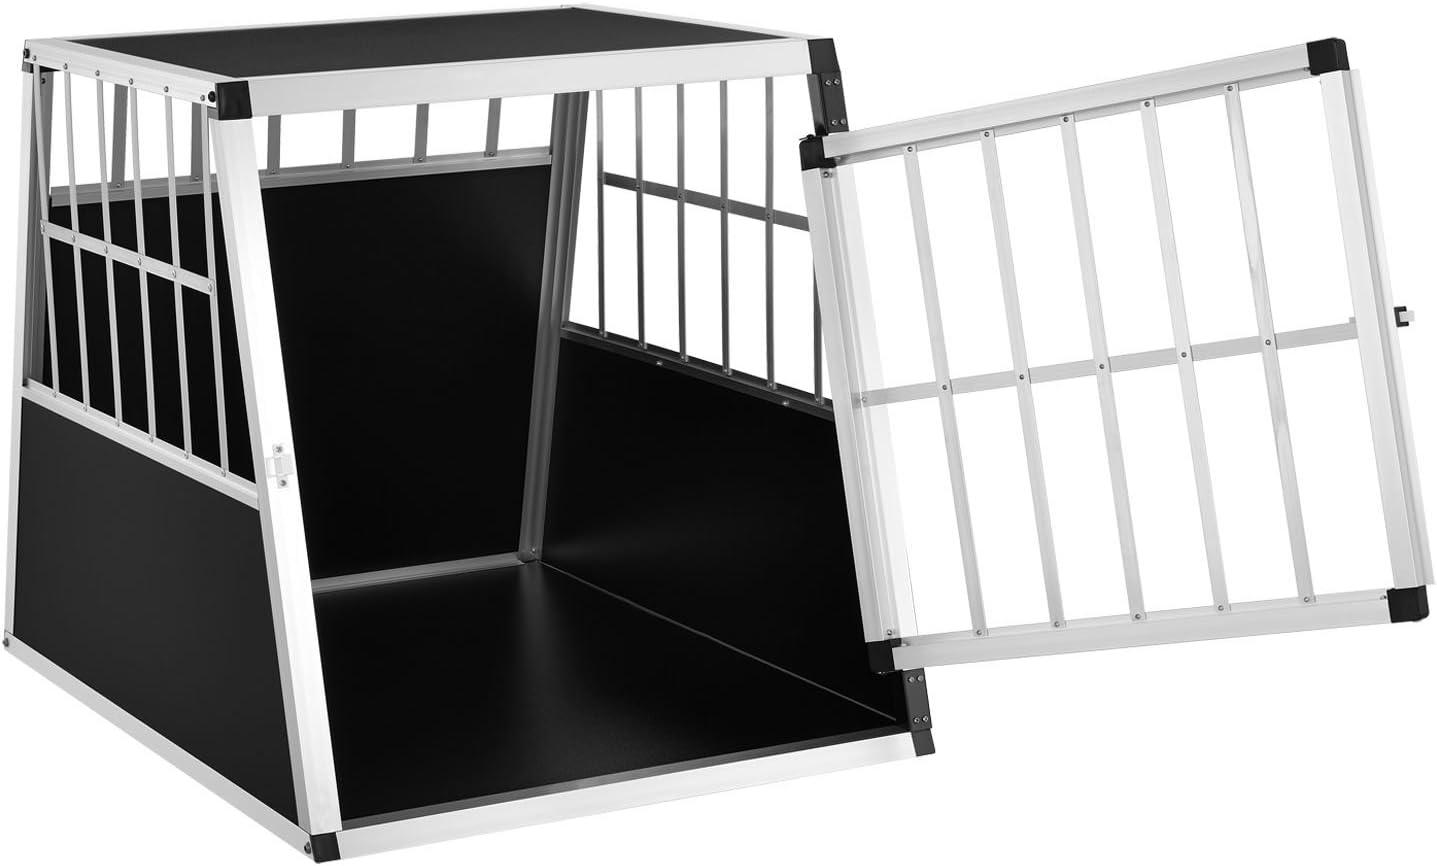 Sam S Pet Alu Hundetransportbox L X 65 91 69 Cm Auto Hundebox Robust Pflegeleicht Gittertür Verschließbar Aluminium Reisebox Für Hunde Haustier